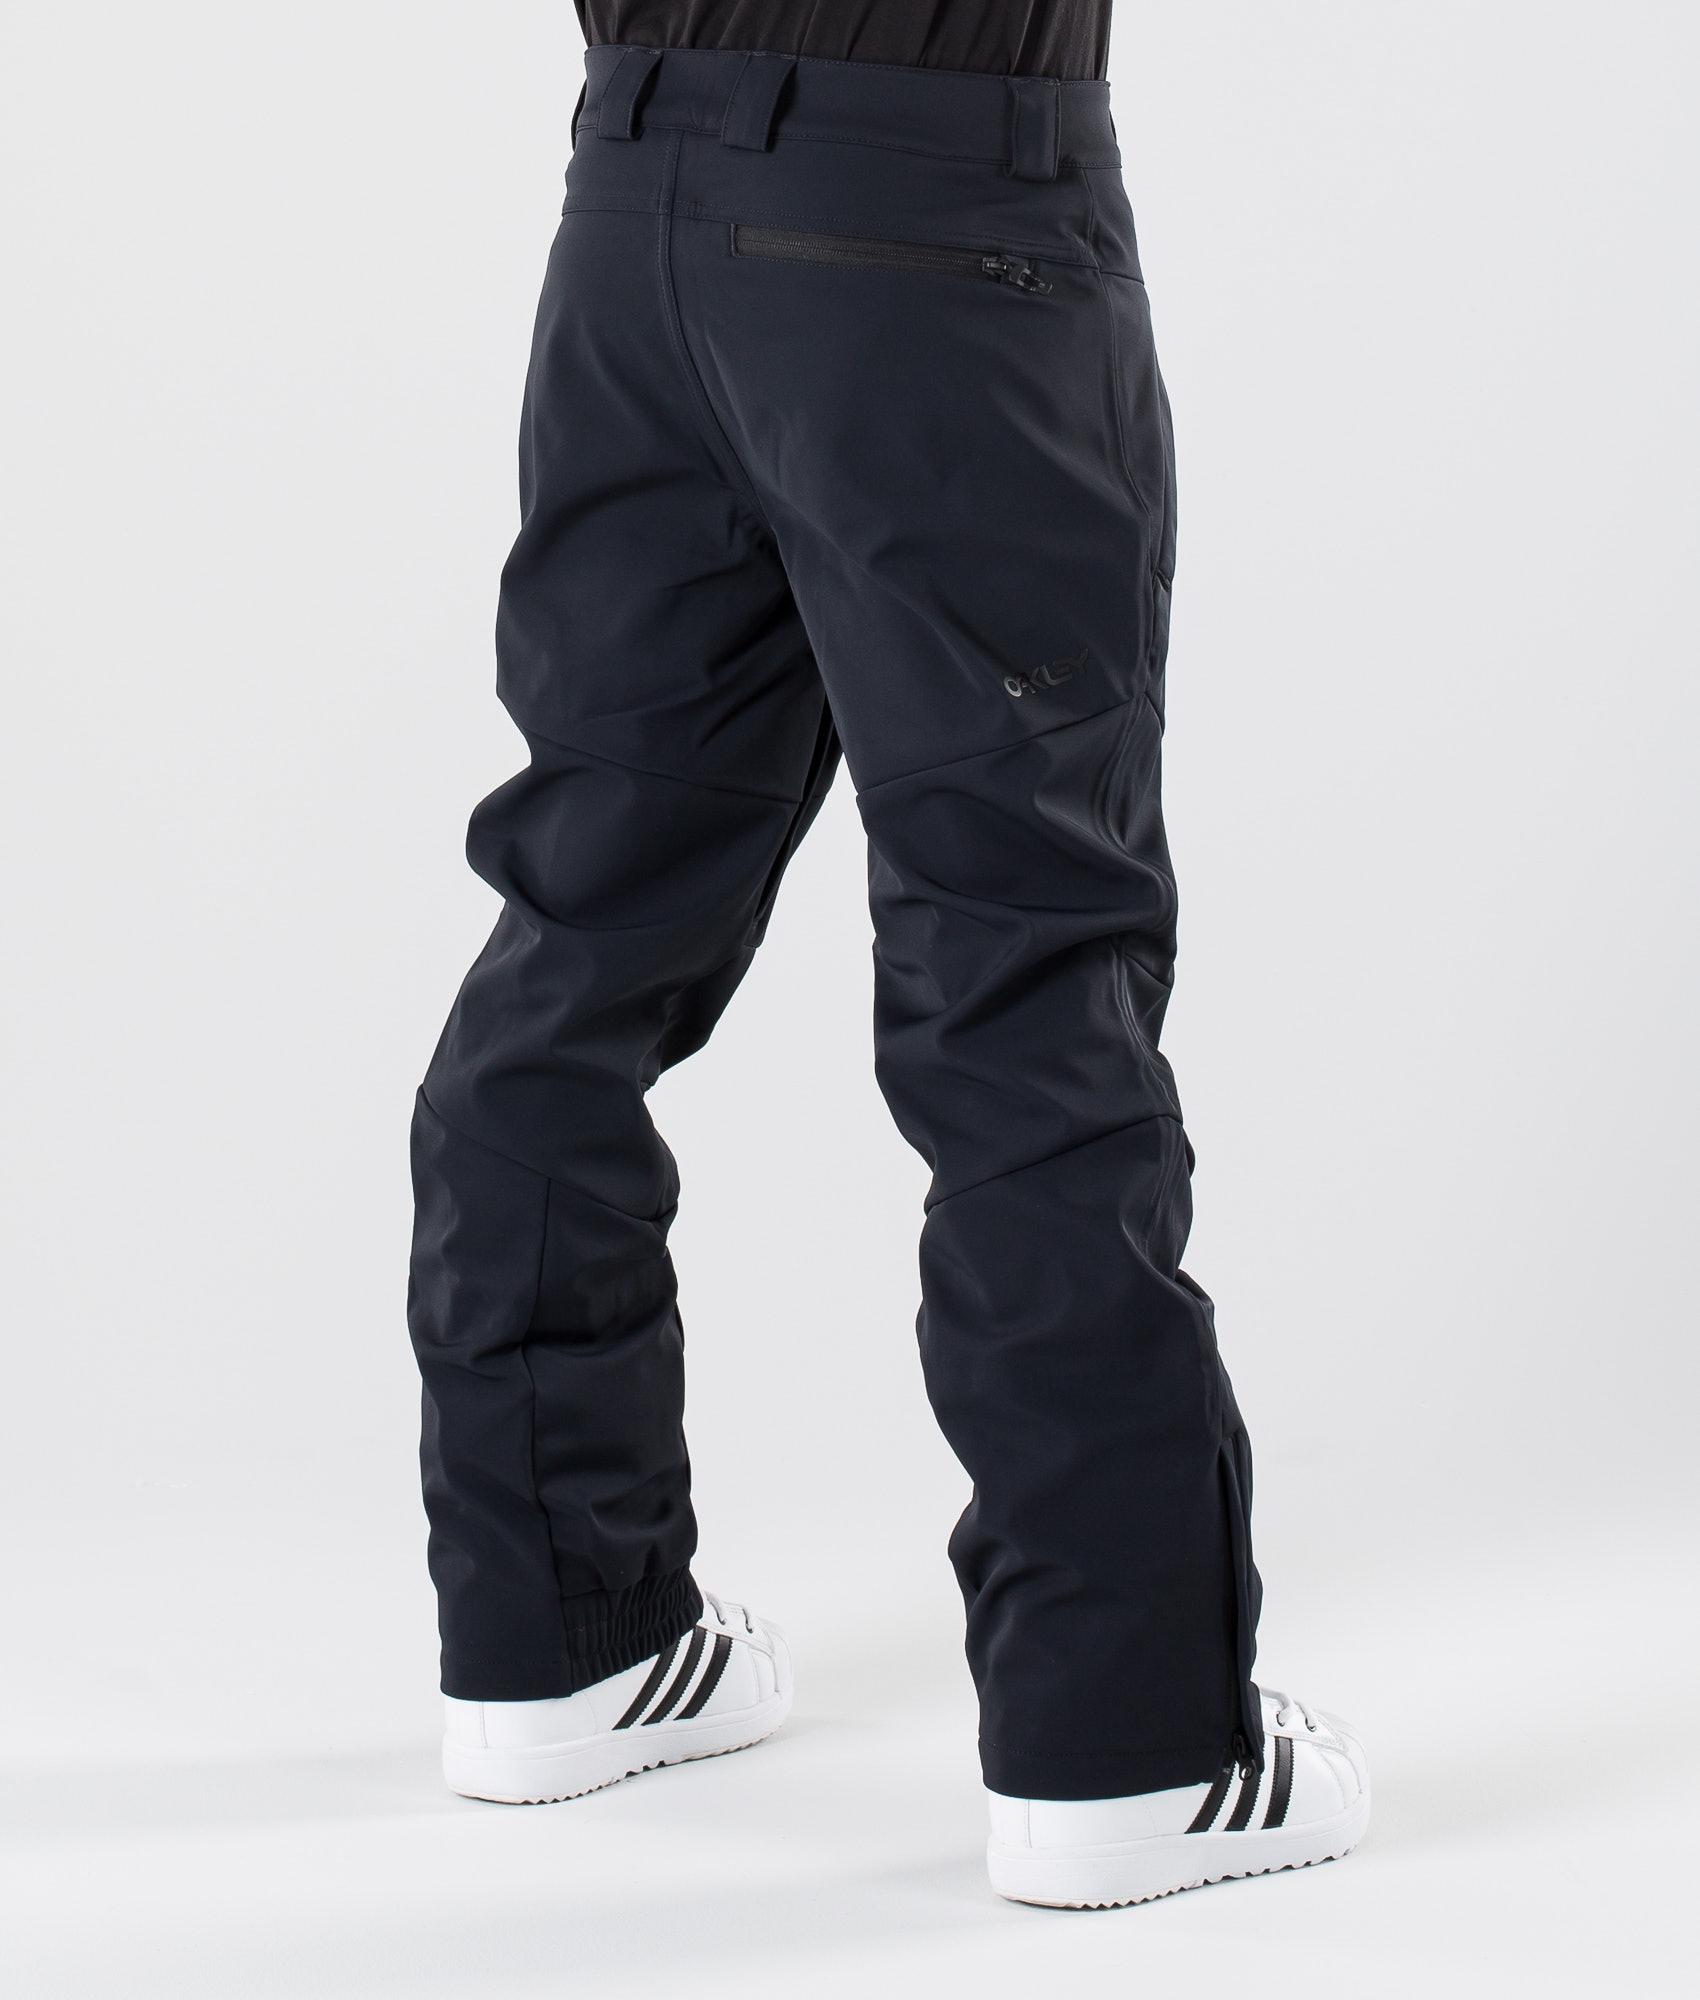 6d475eea7d Oakley Soft Shell 10K Snow Pants Blackout - Ridestore.com